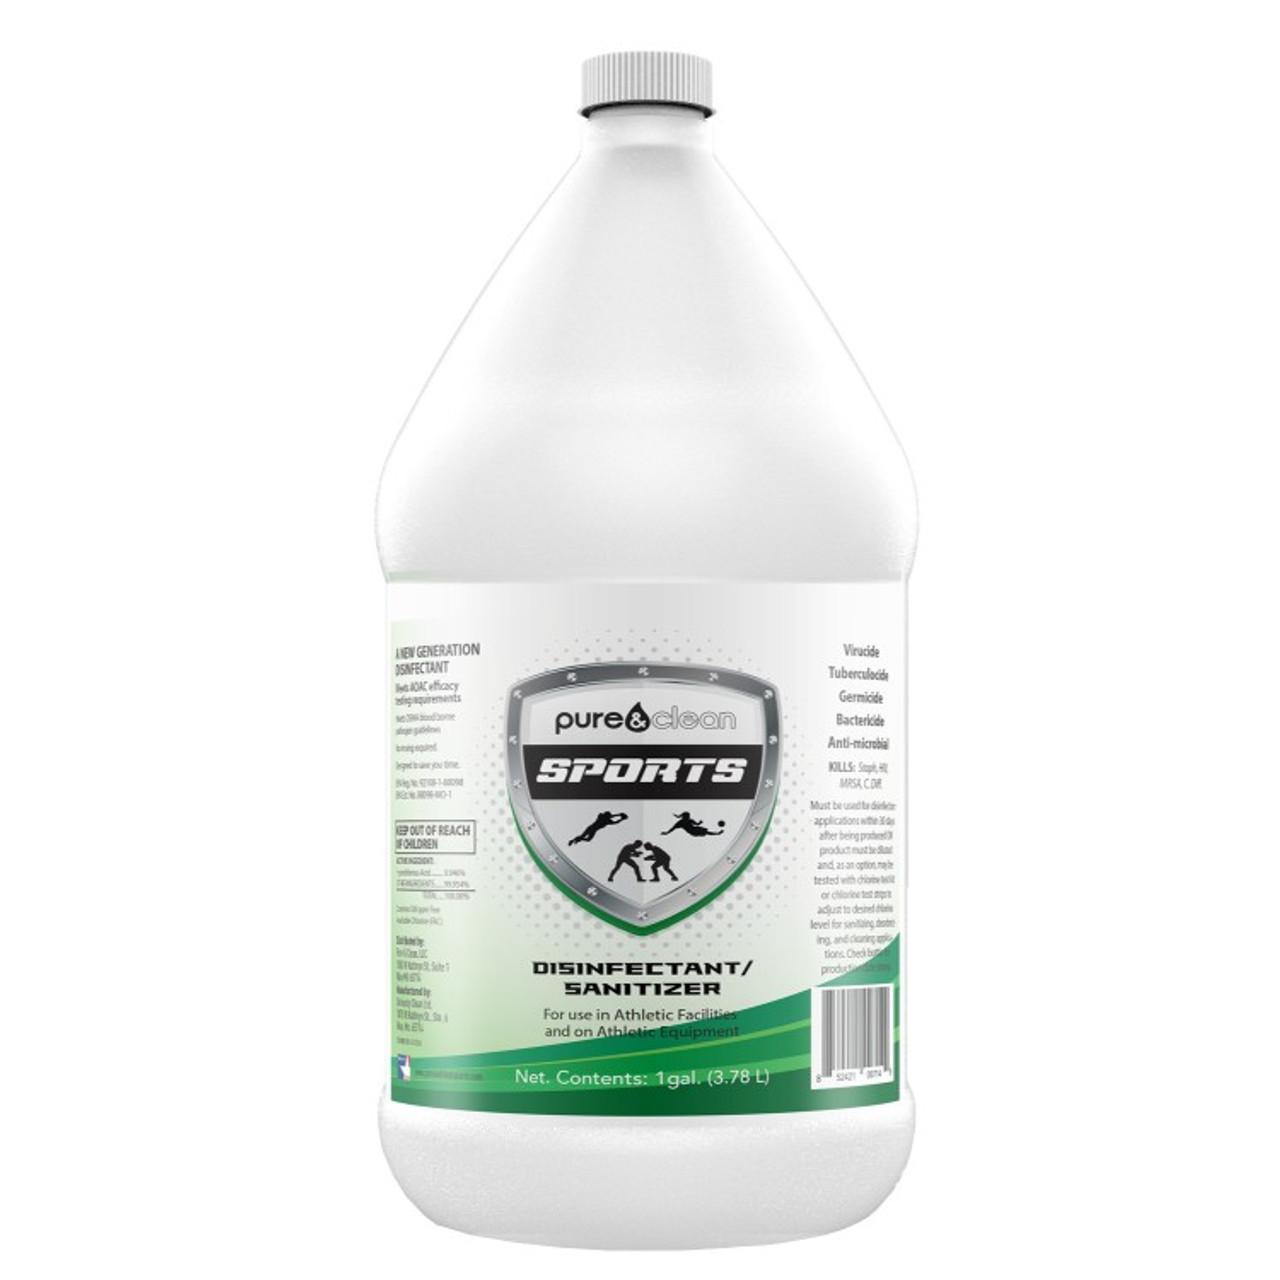 Disinfectant Sanitizer - 4 Gallon Pack